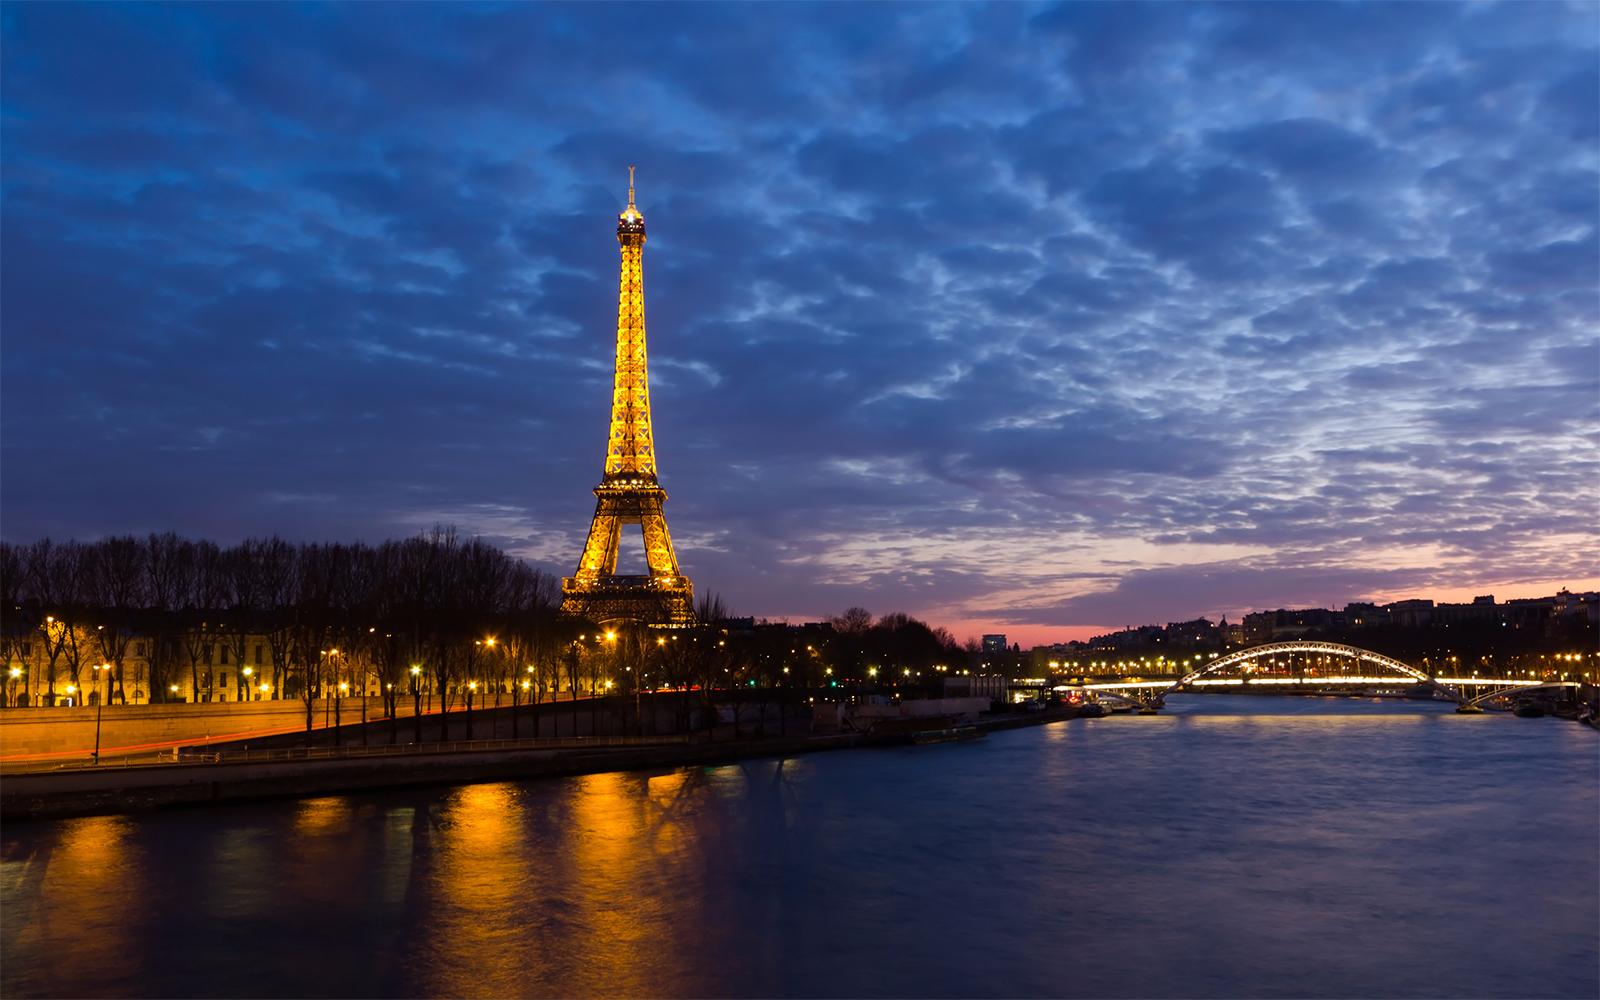 Eiffel Tower Visit